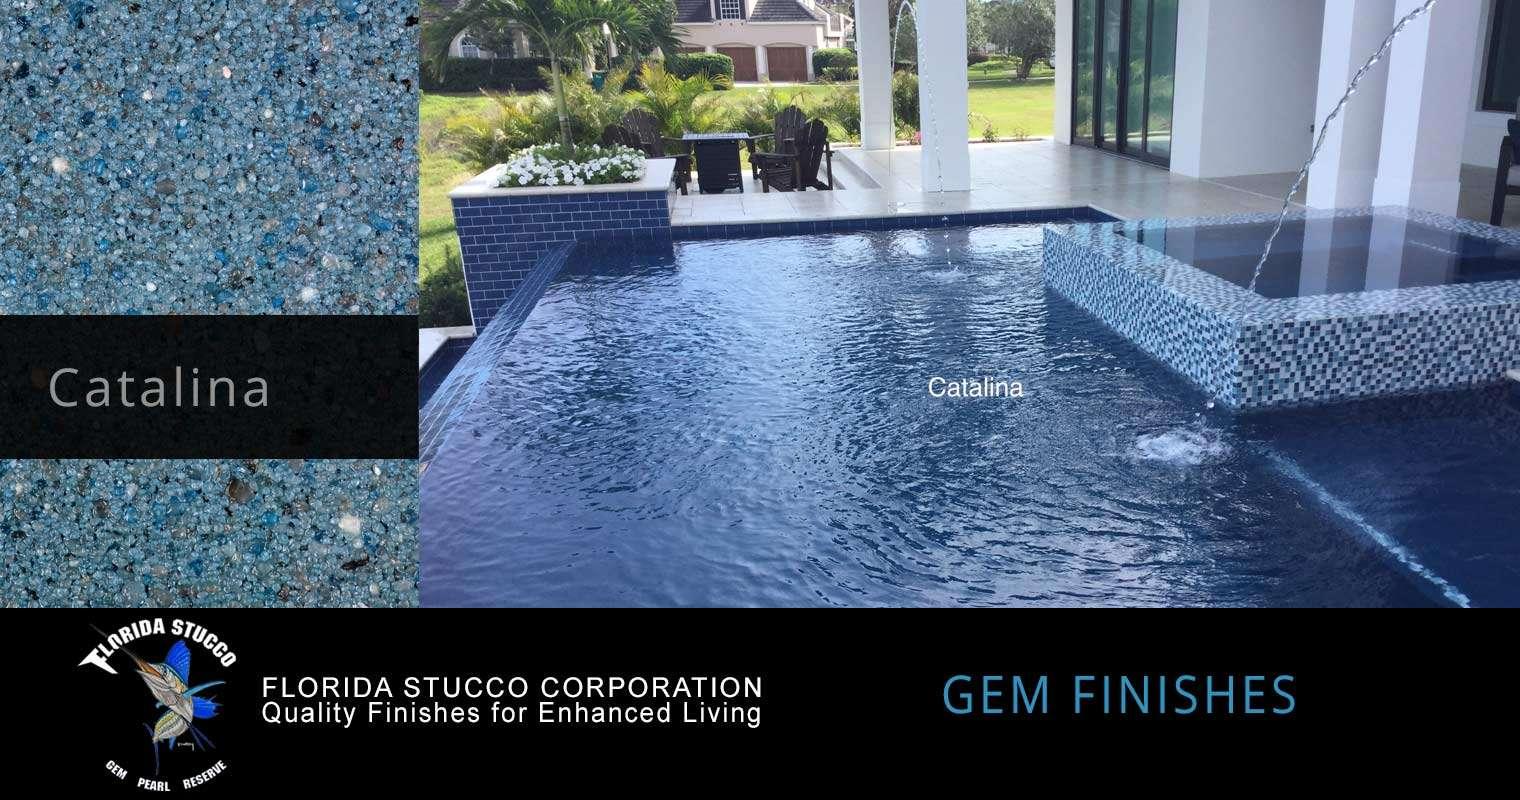 Florida Stucco - Catalina Gem Plastering Finish Pool Sample 1